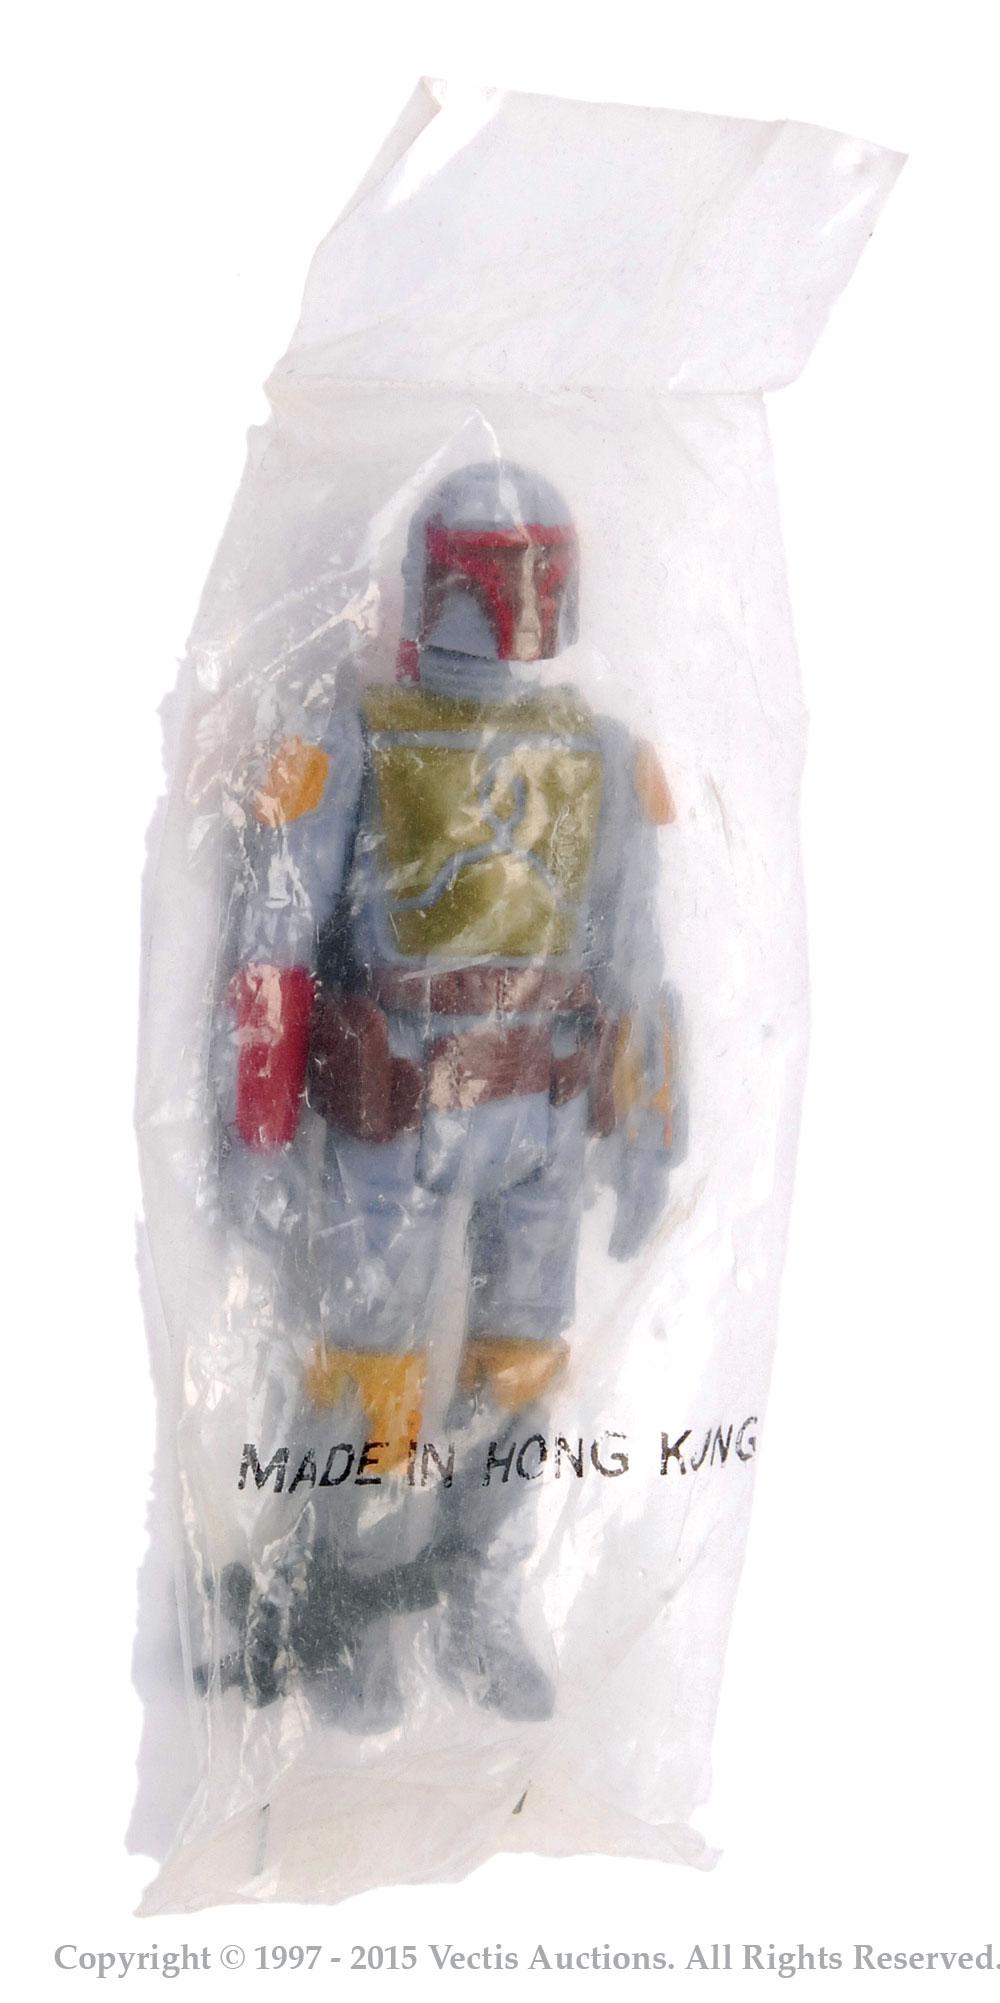 "Star Wars Boba Fett 3 3/4"" vintage figure"